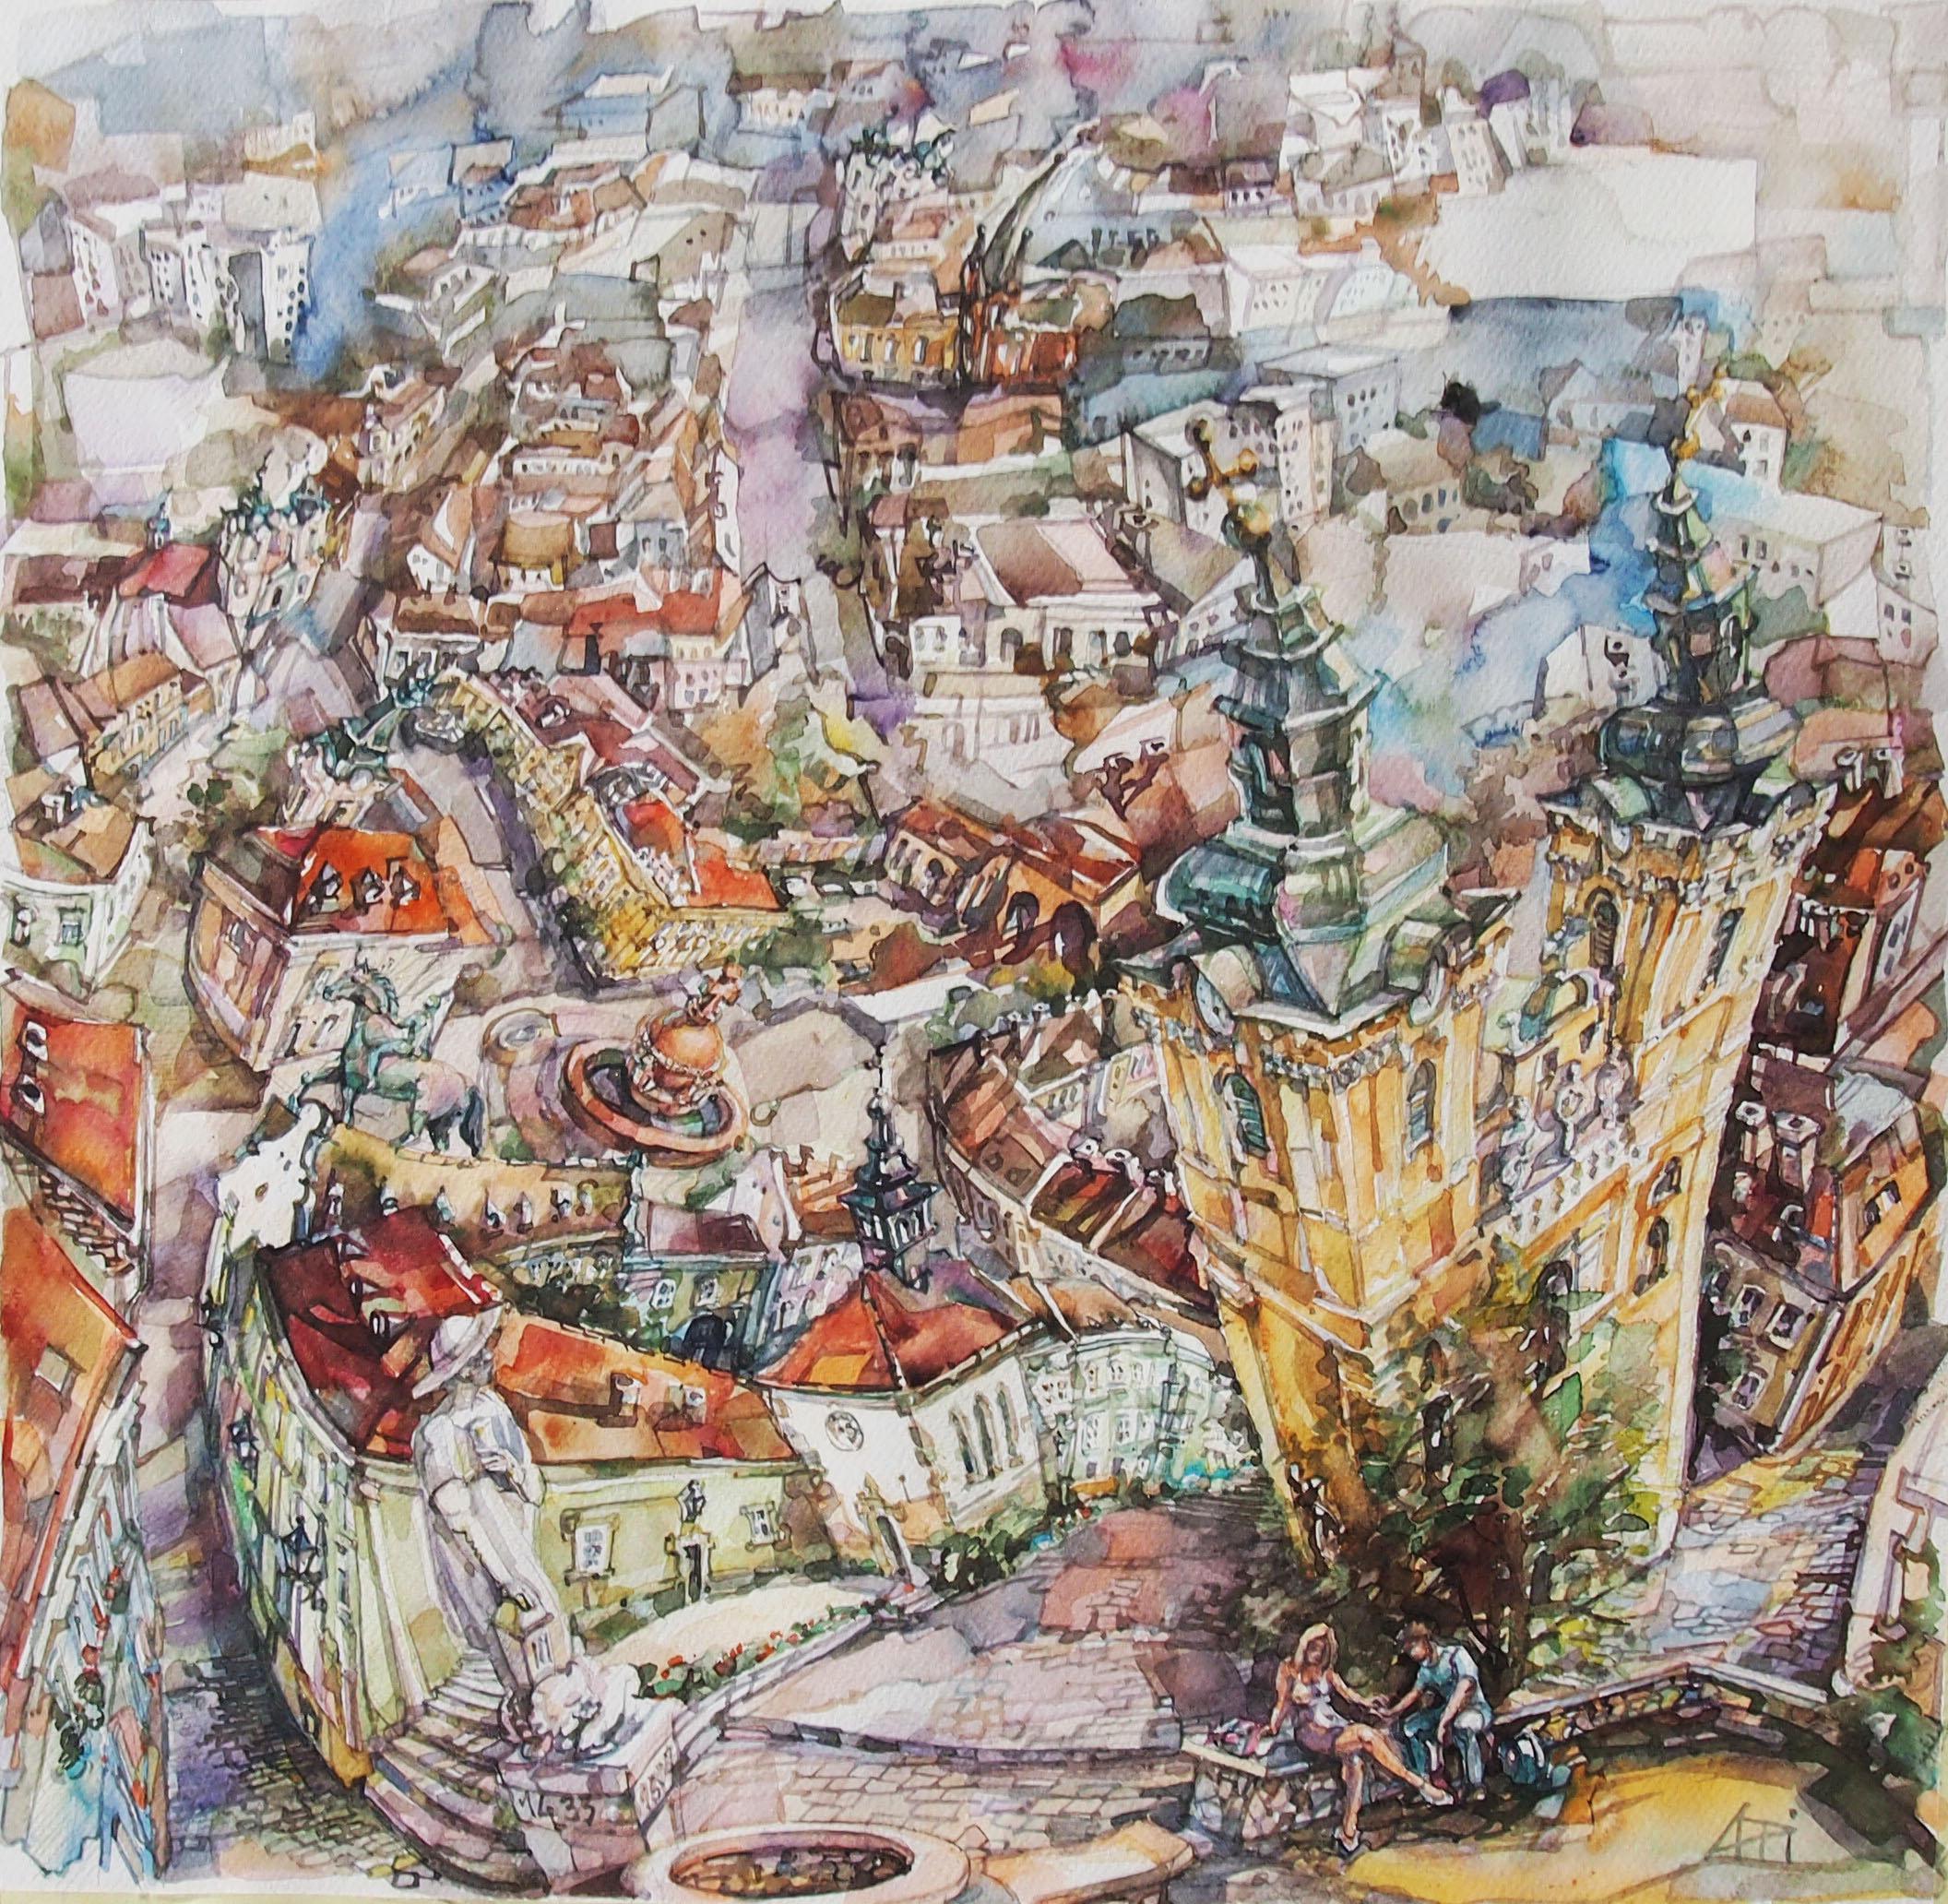 Gorbulodo-Terulok-fordulok-(akvarell-50x50-paszpartu-uveg-keret)-95000-Ft.jpg